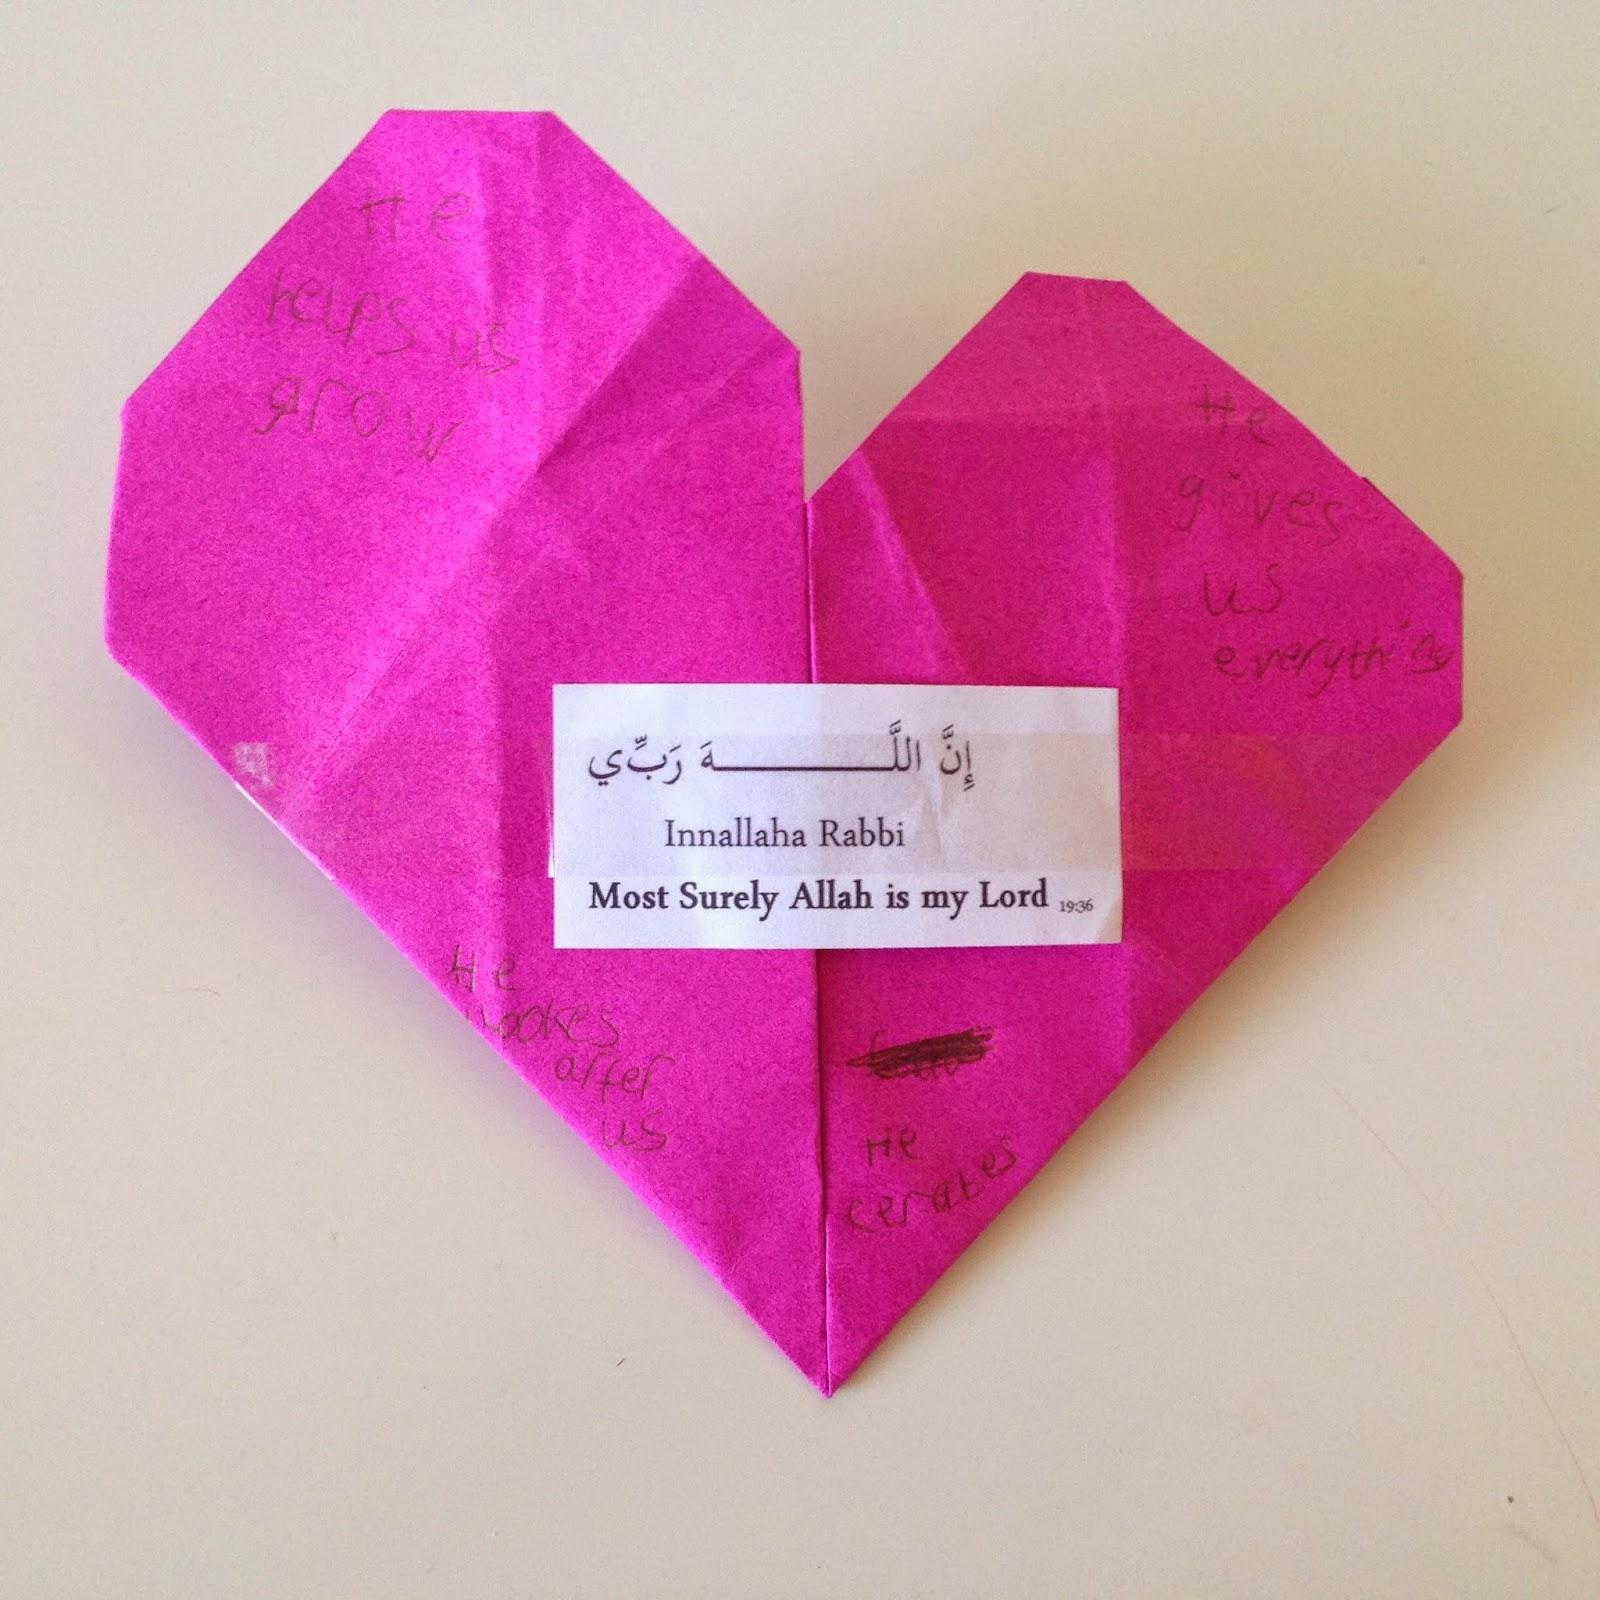 6 easy activities with Valentine's Origami hearts for preschoolers | 1600x1600